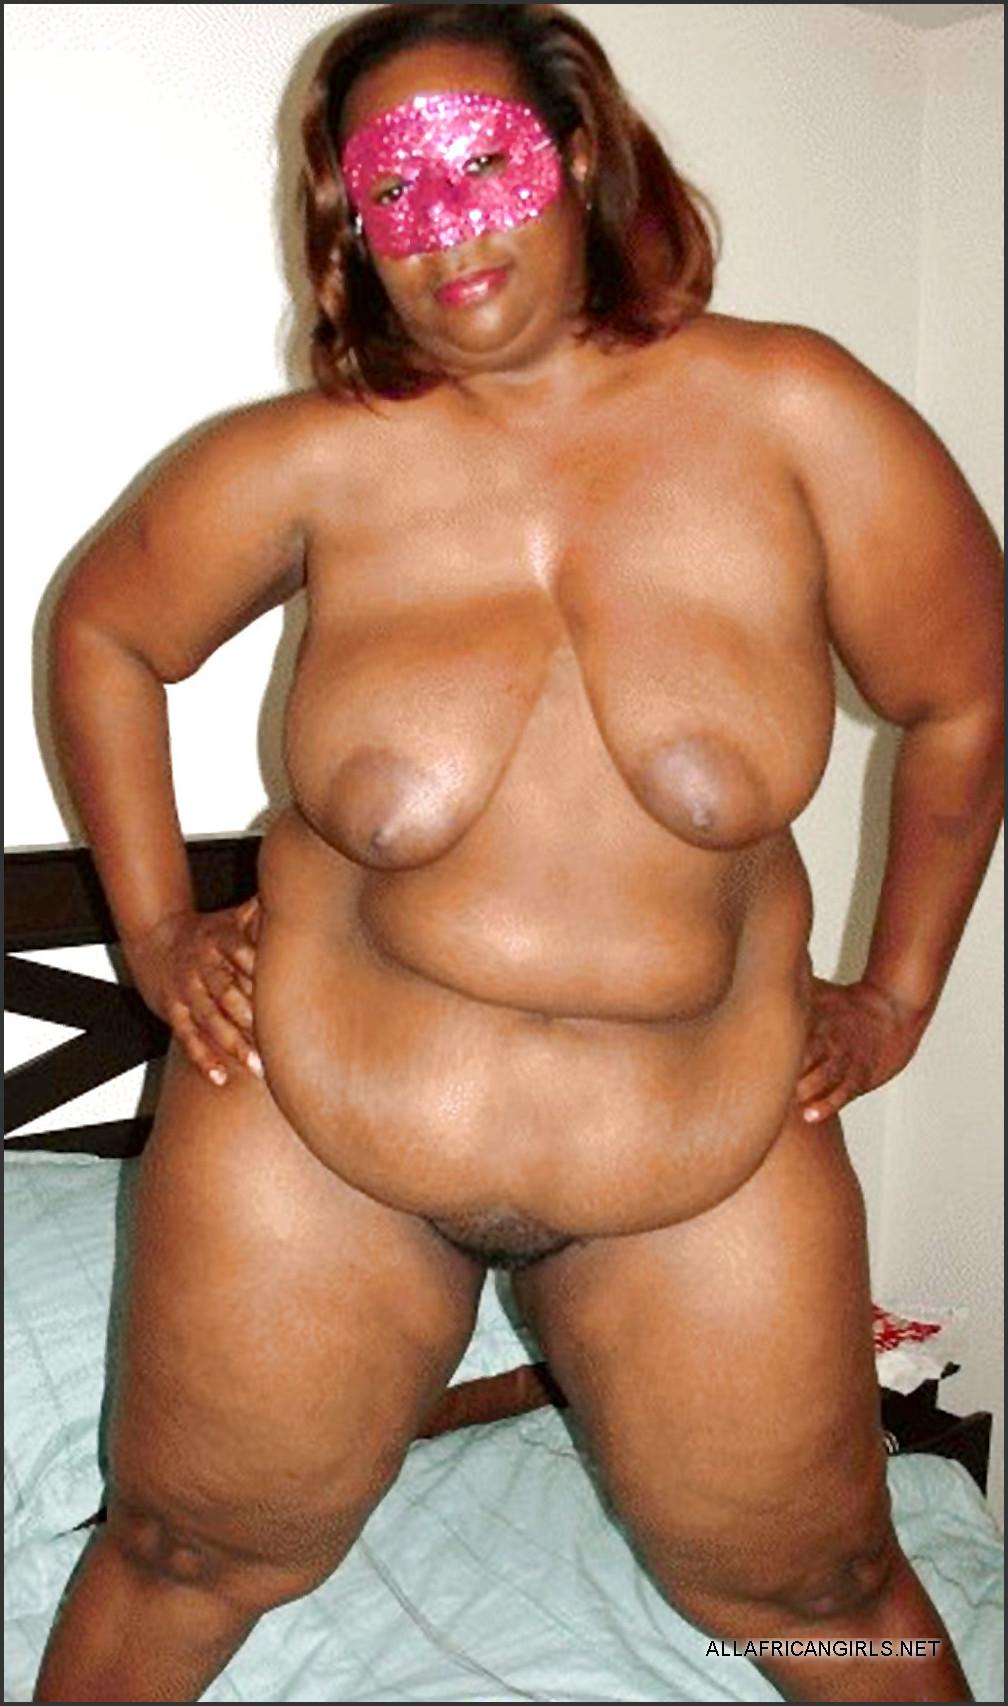 Caitlin stasey nude pics